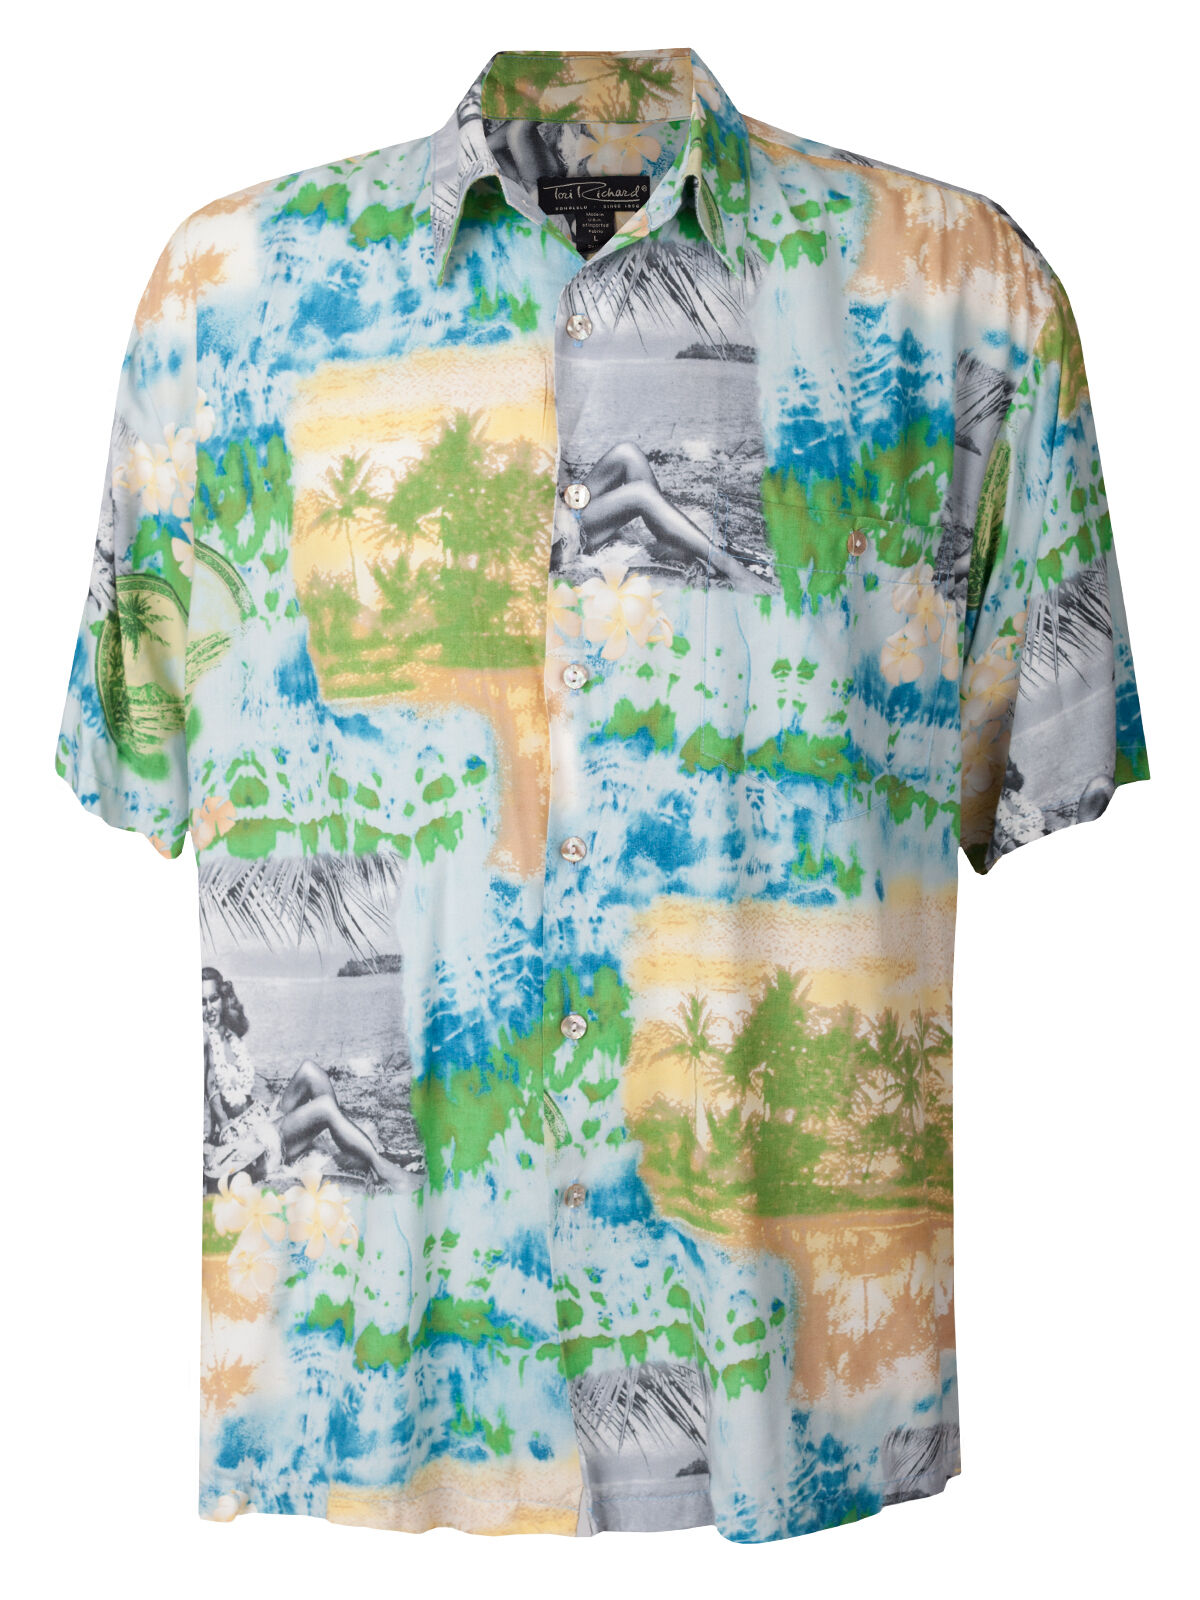 Men's Tori Richard Hawaiian Button Shirt Hula Girl Beach Tropical Vtg Viscose L